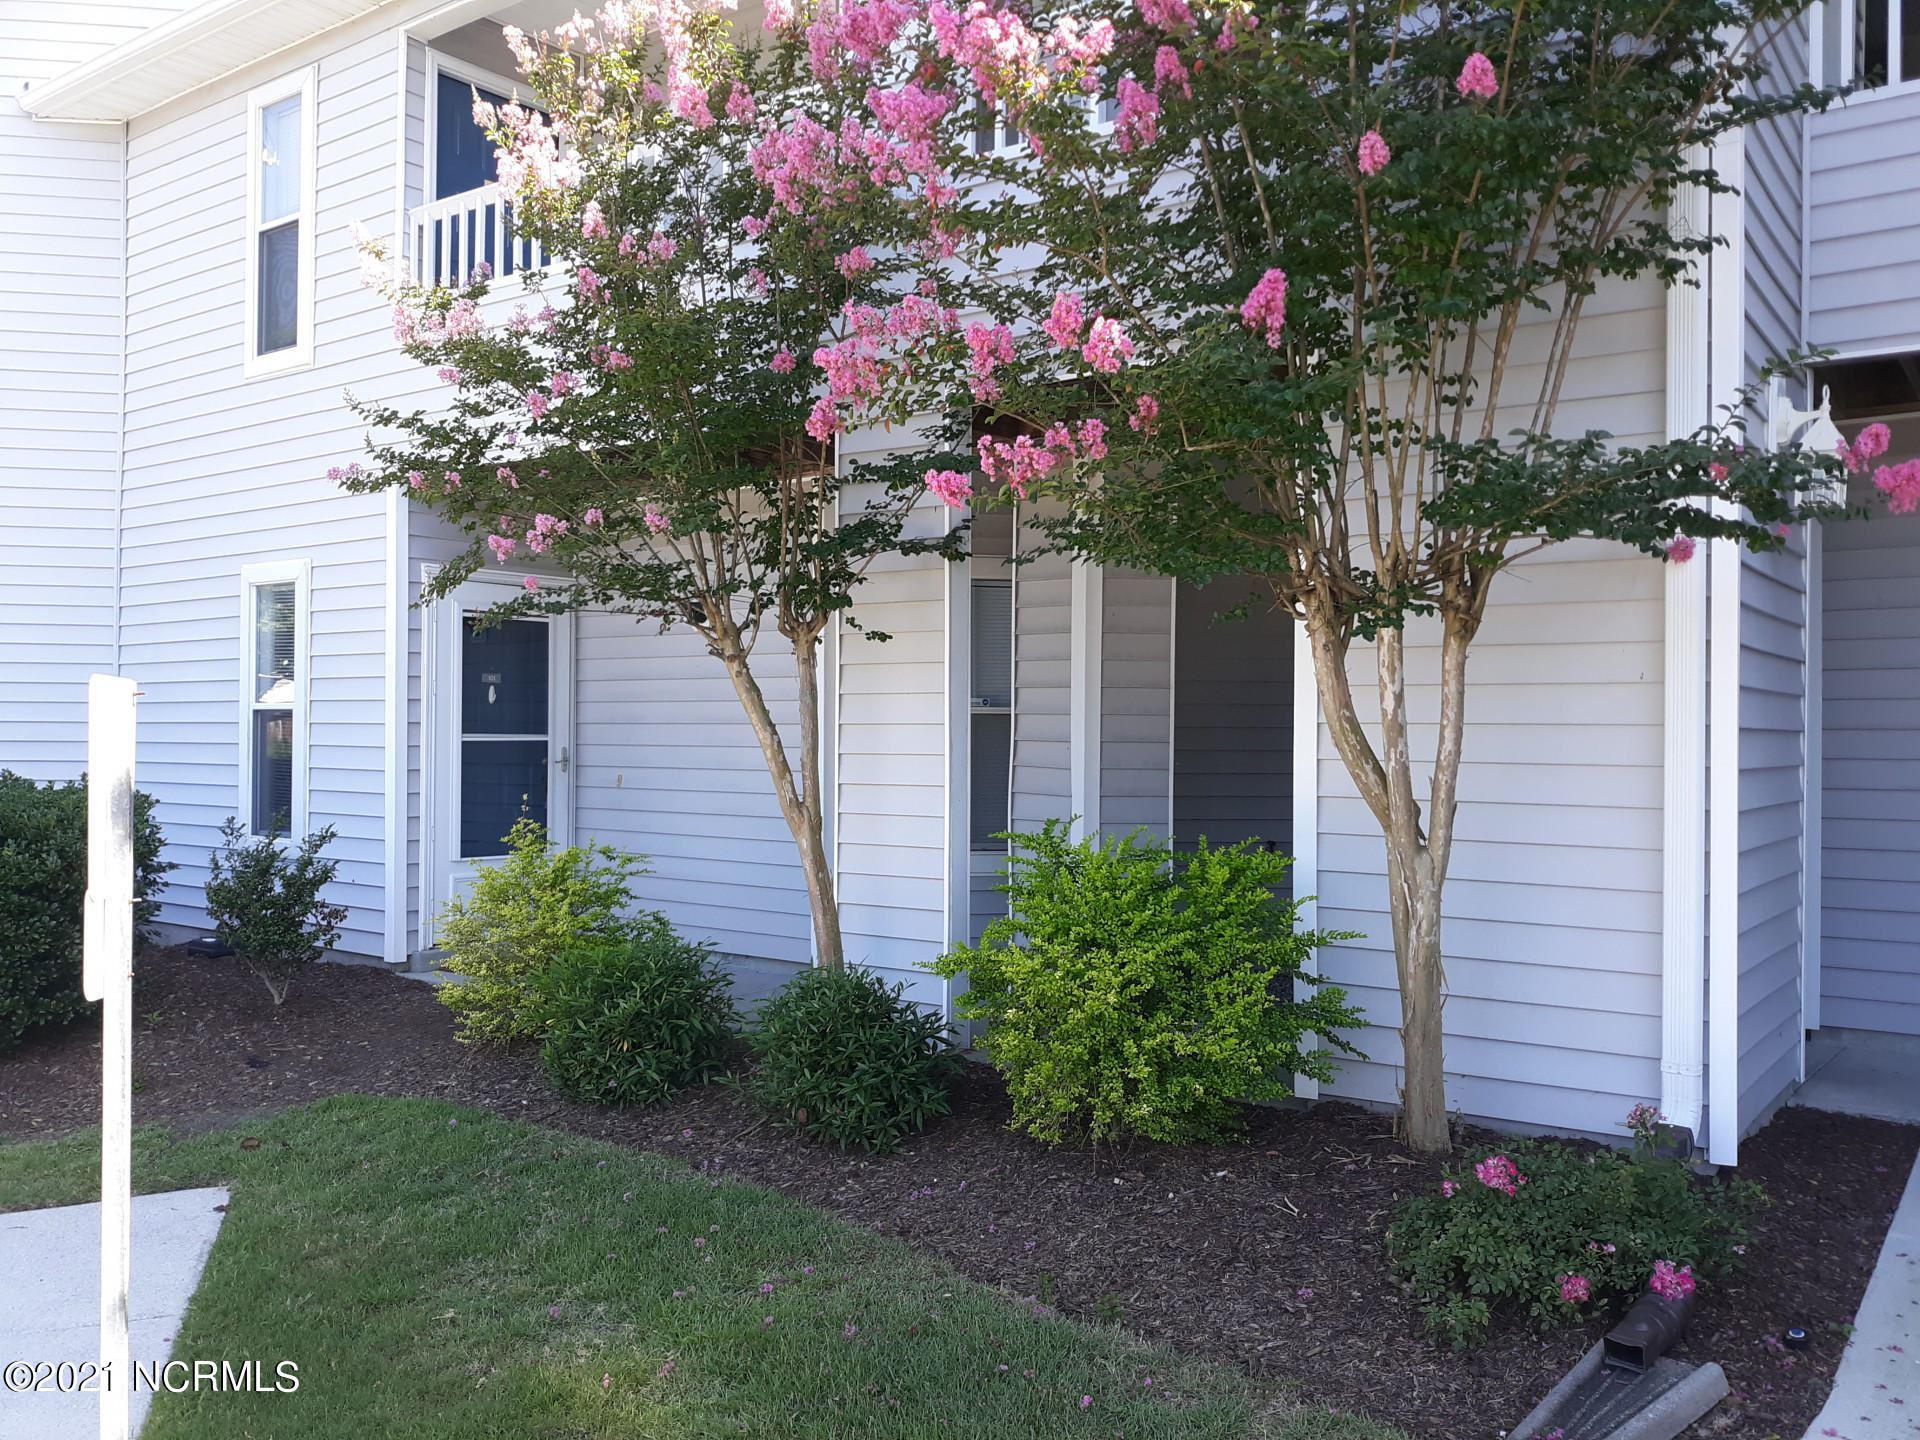 Photo for 4166 Breezewood Drive, Wilmington, NC 28412 (MLS # 100285355)